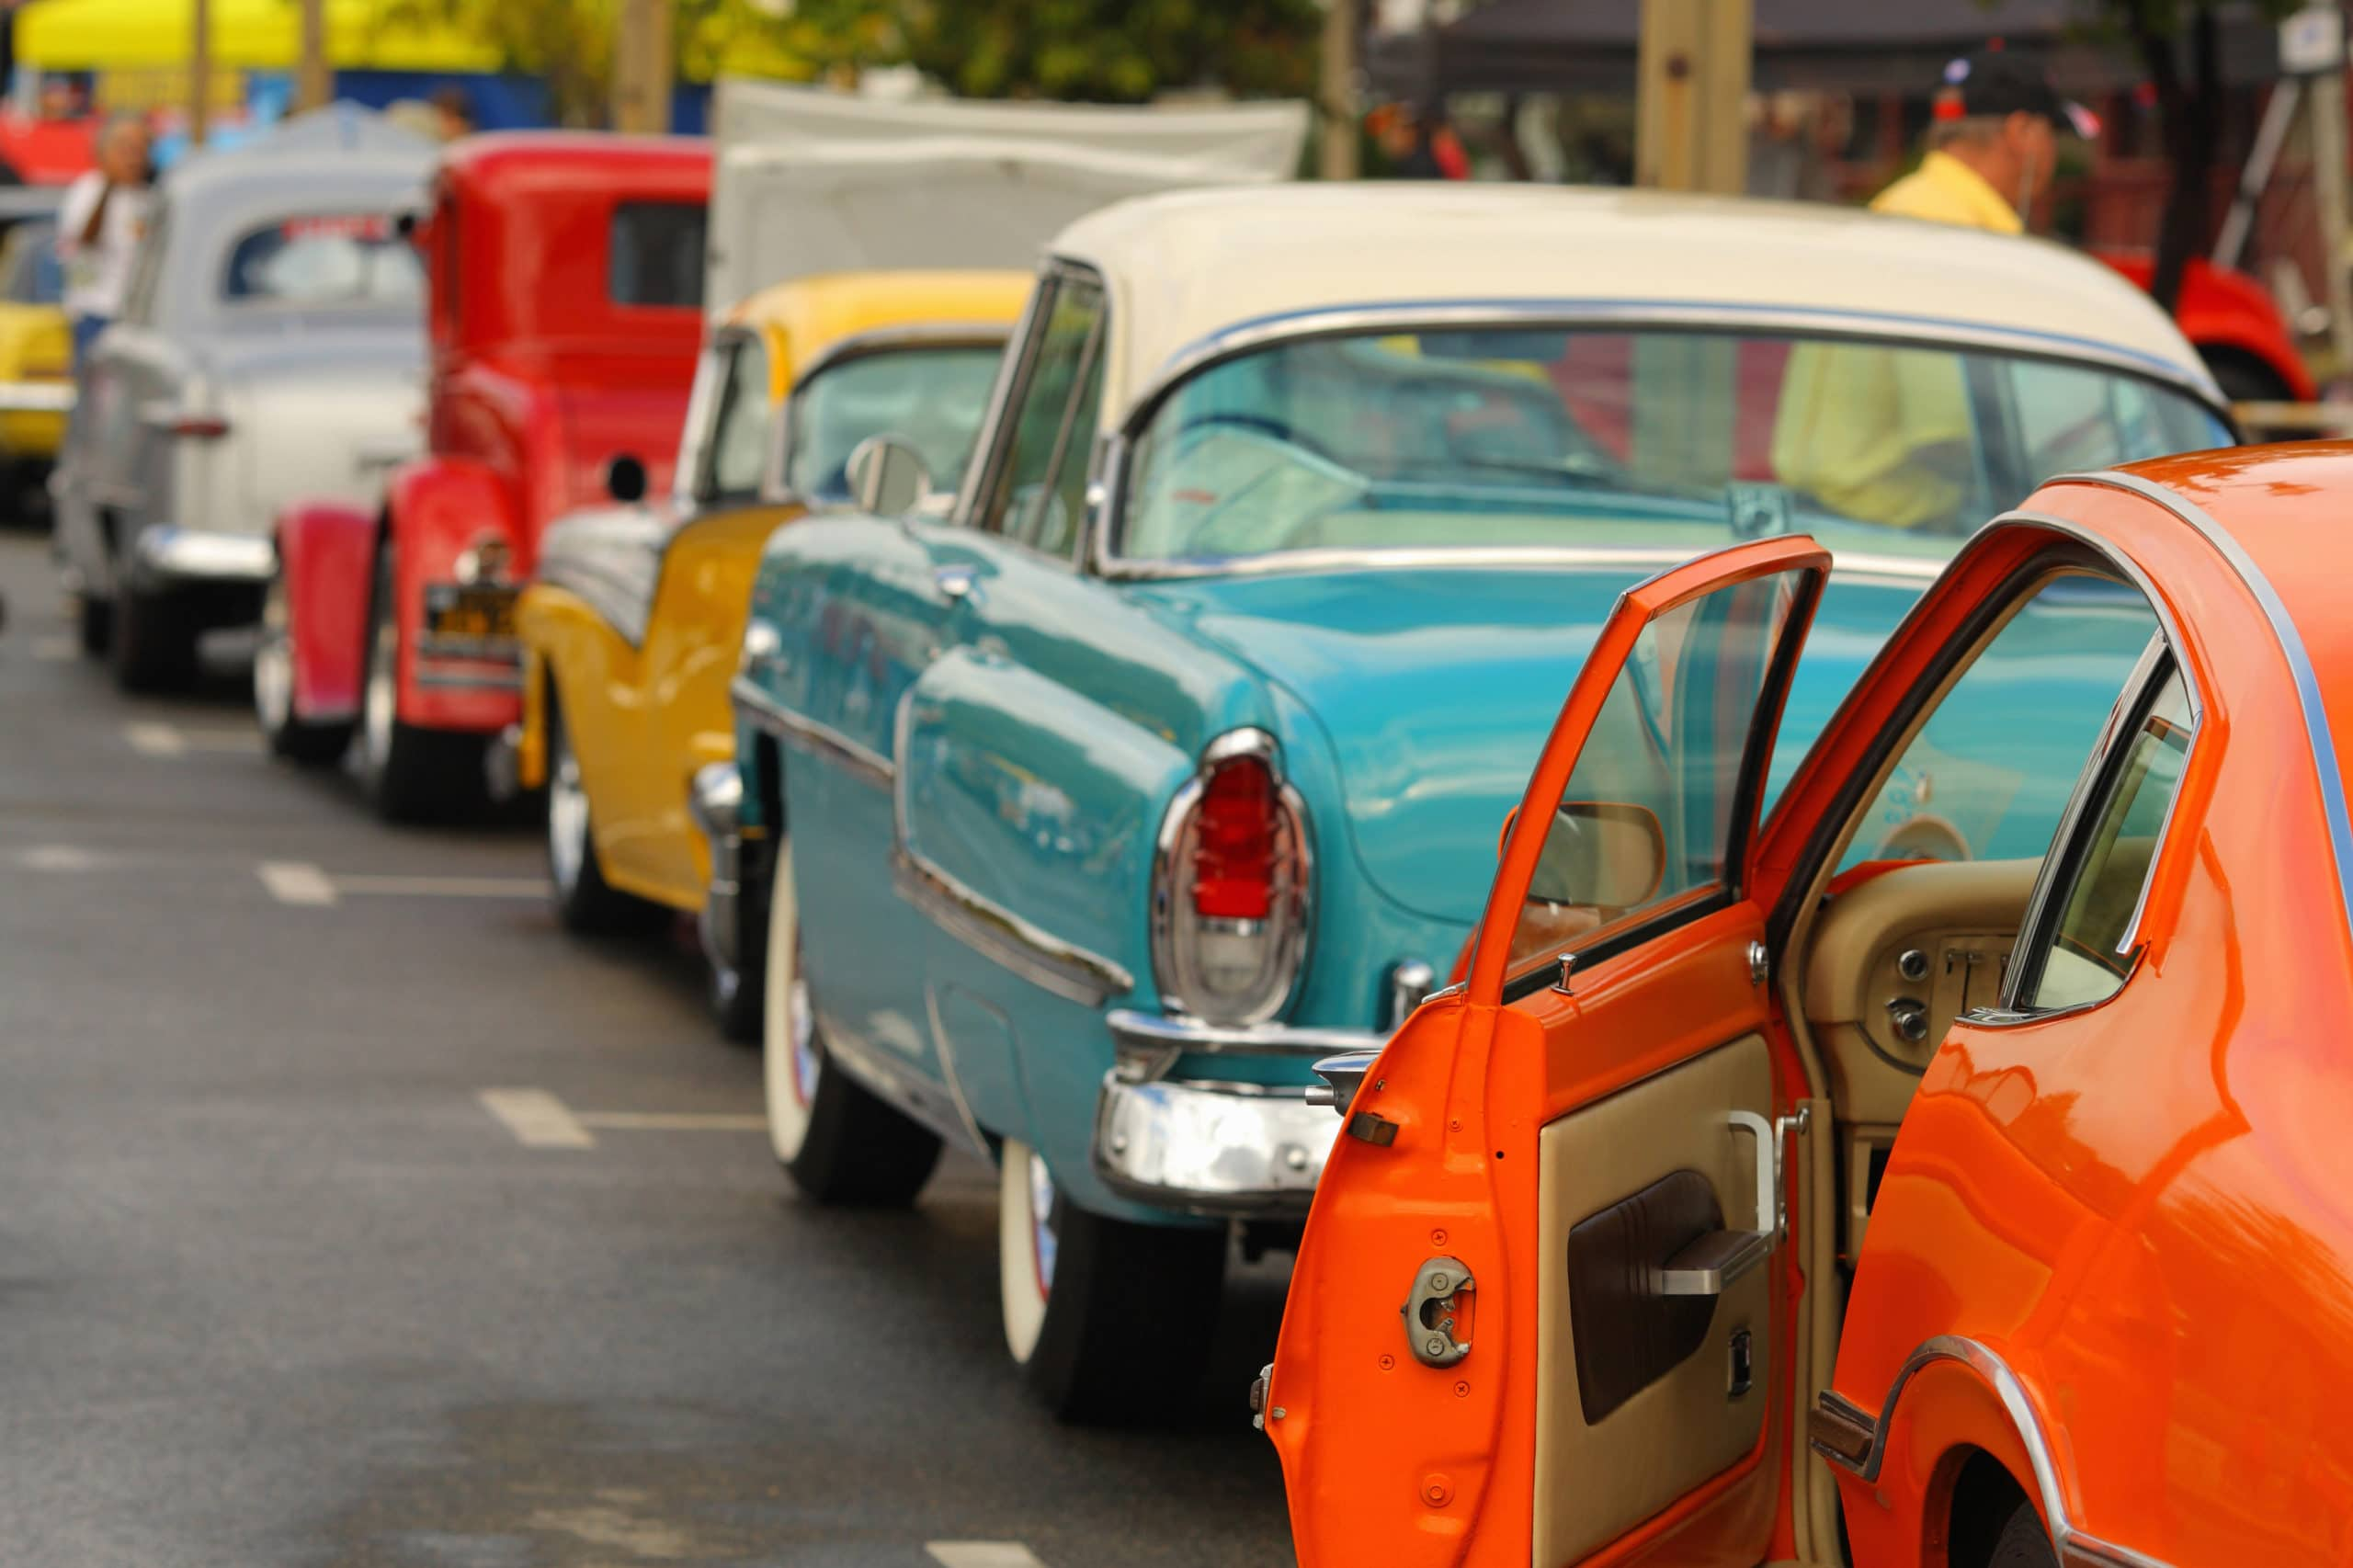 Defrosters for Vintage Cars